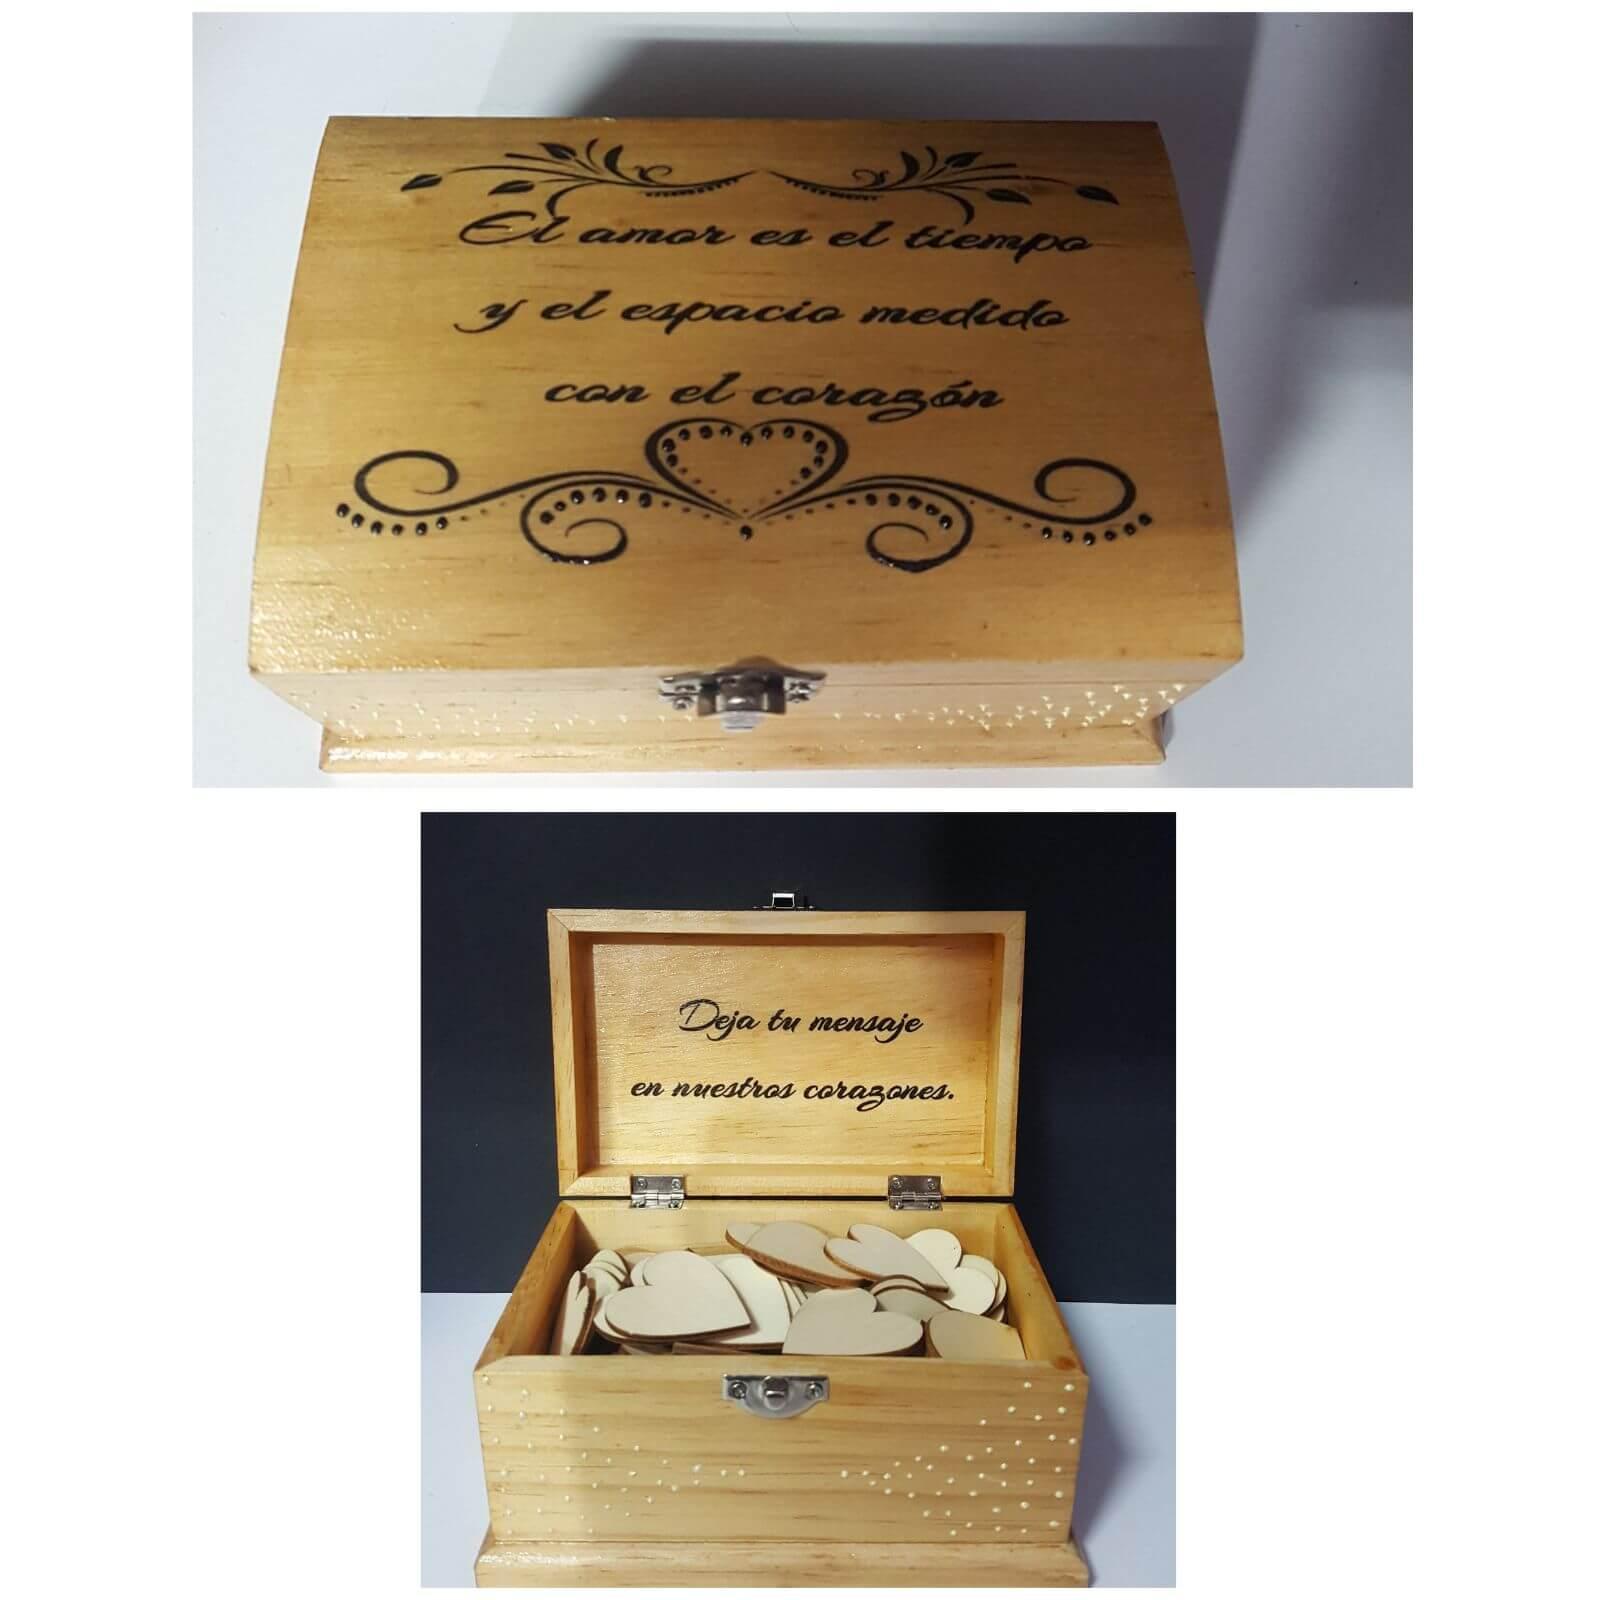 Caja de madera para libro de firmas caja de madera para libro de firmas - Caja de madera para libro de firmas - Caja de madera para libro de firmas